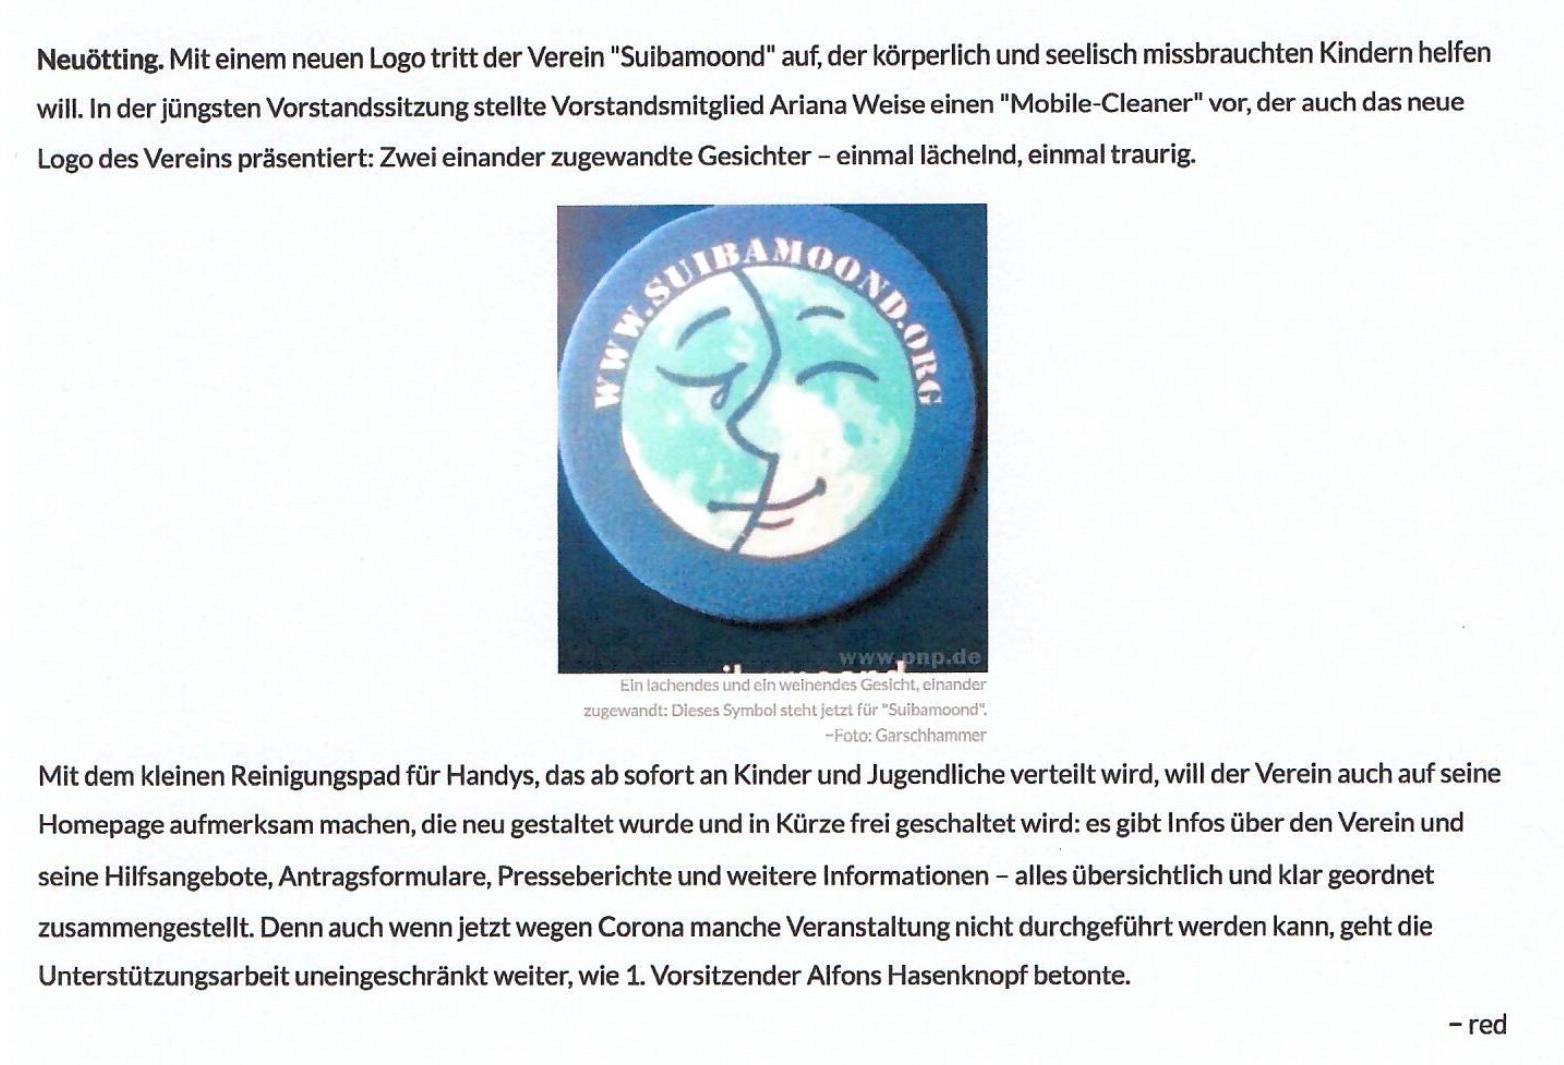 neues-logo-fuer-suibamoond